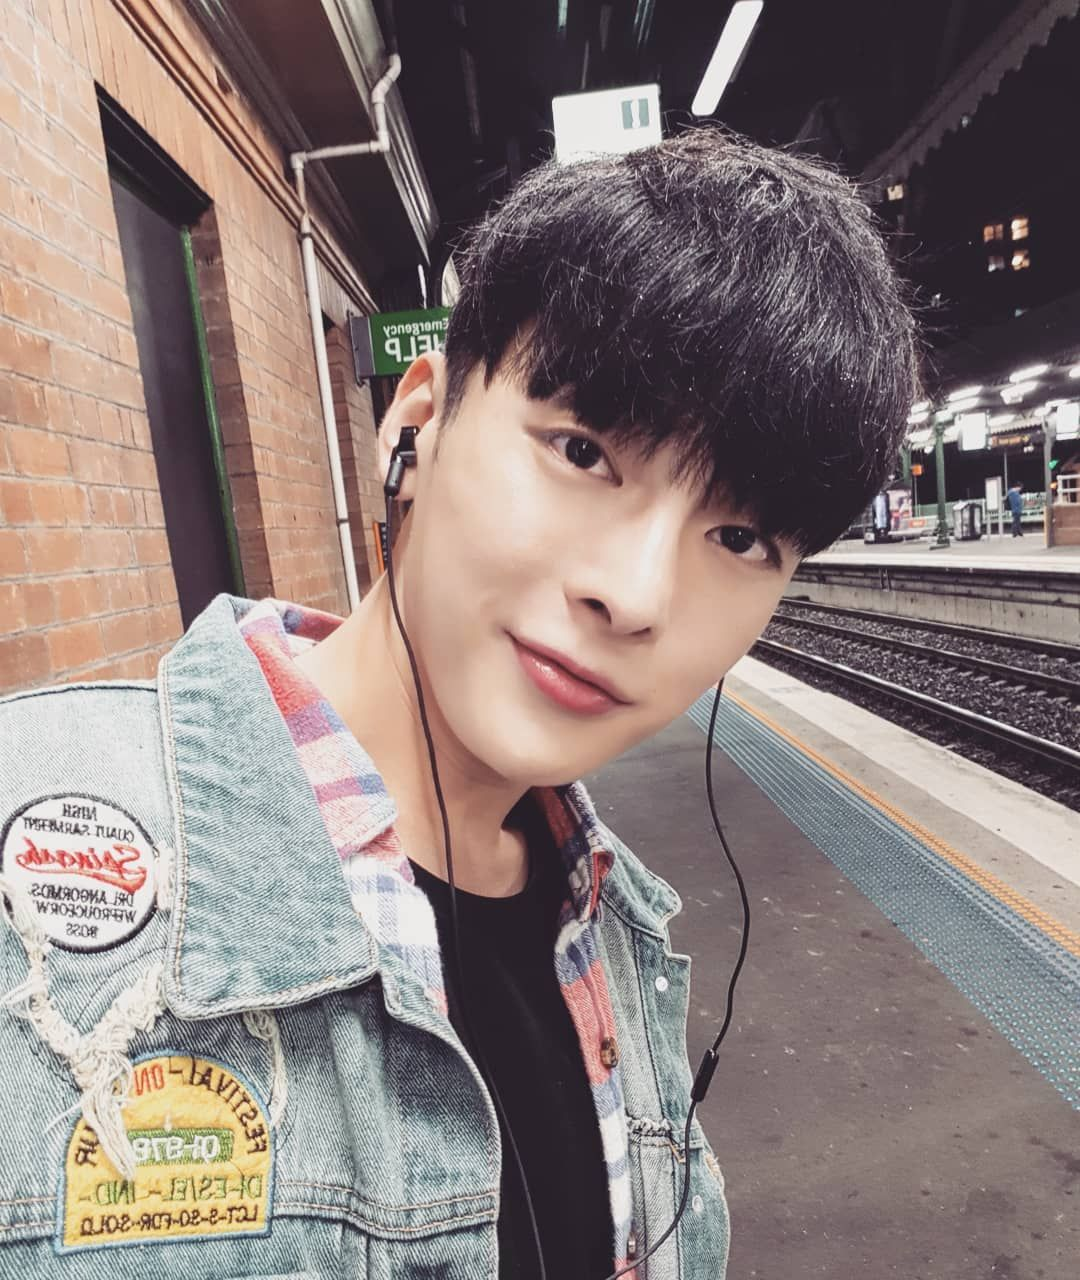 Strathfield Hello Kpopidol Sibong Selfie Asian Celebrities Instagram Selfie